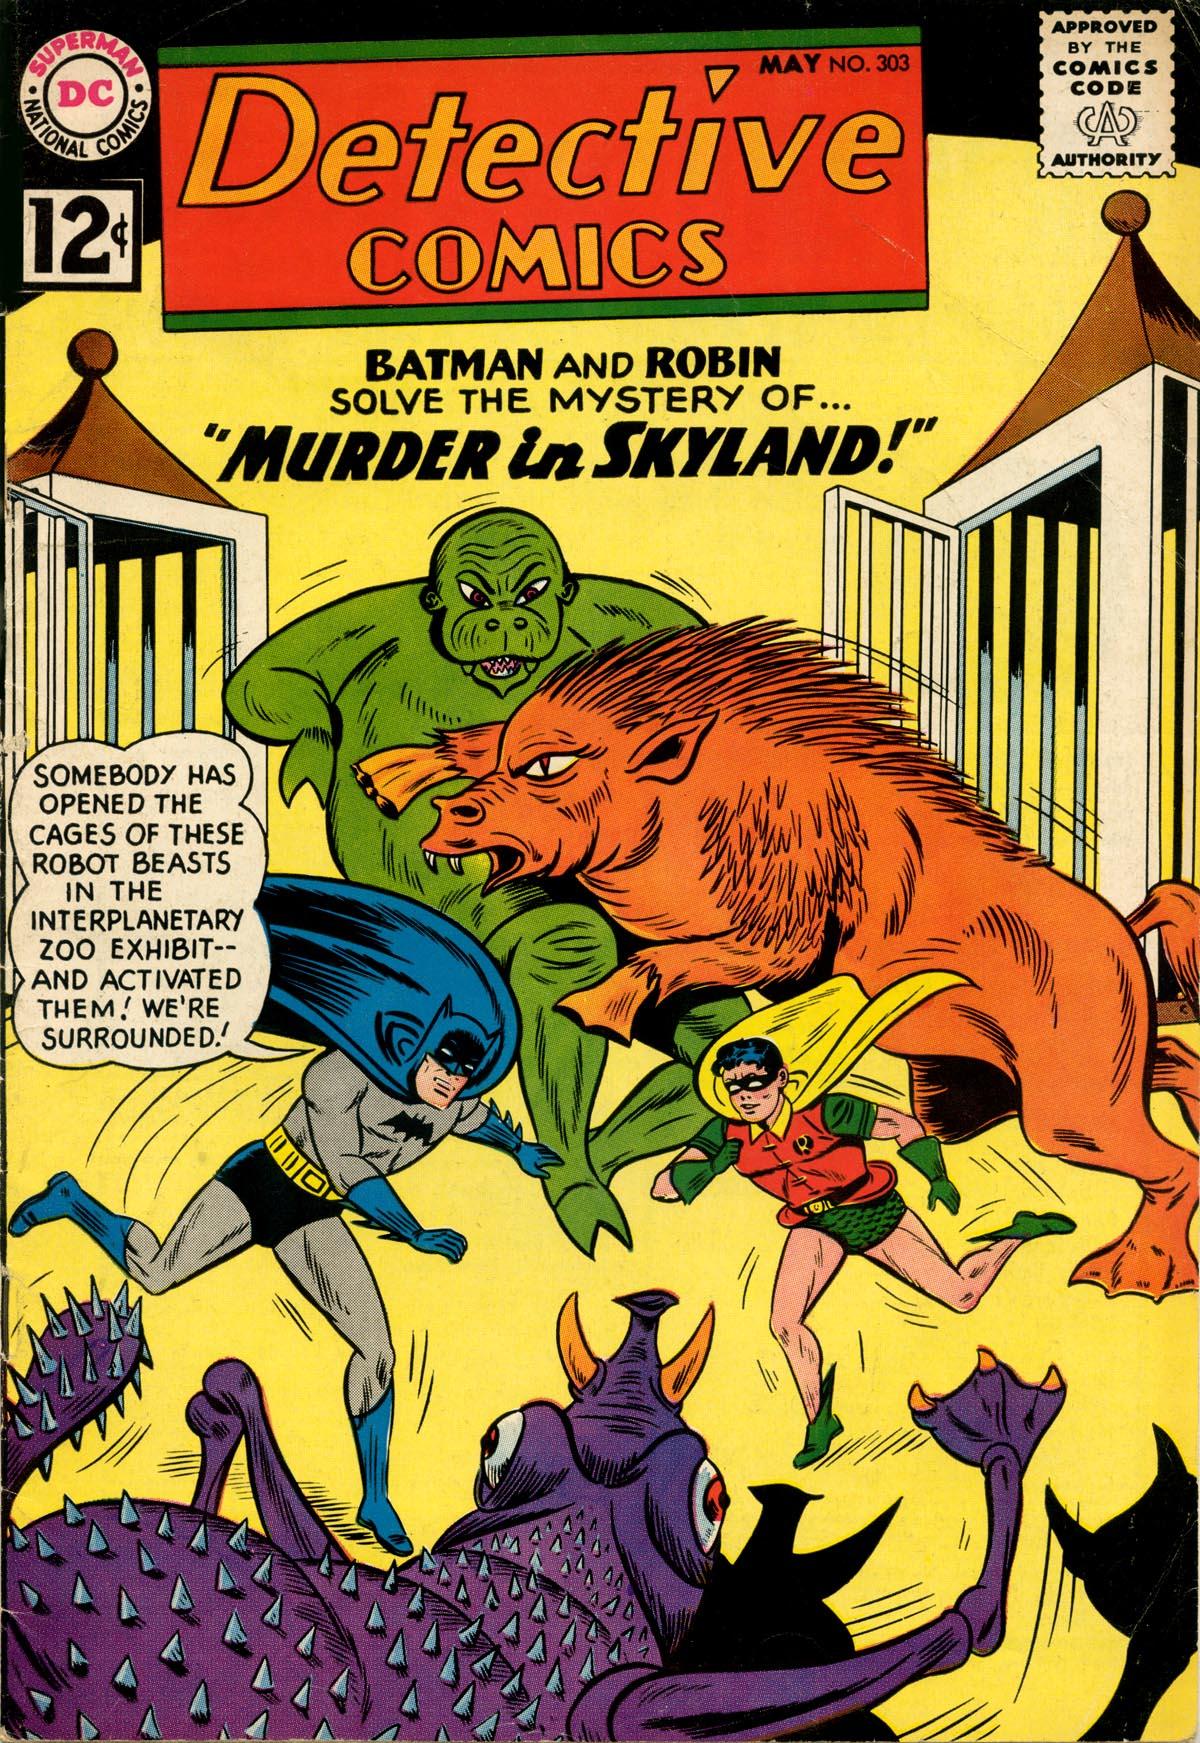 Detective Comics (1937) 303 Page 0